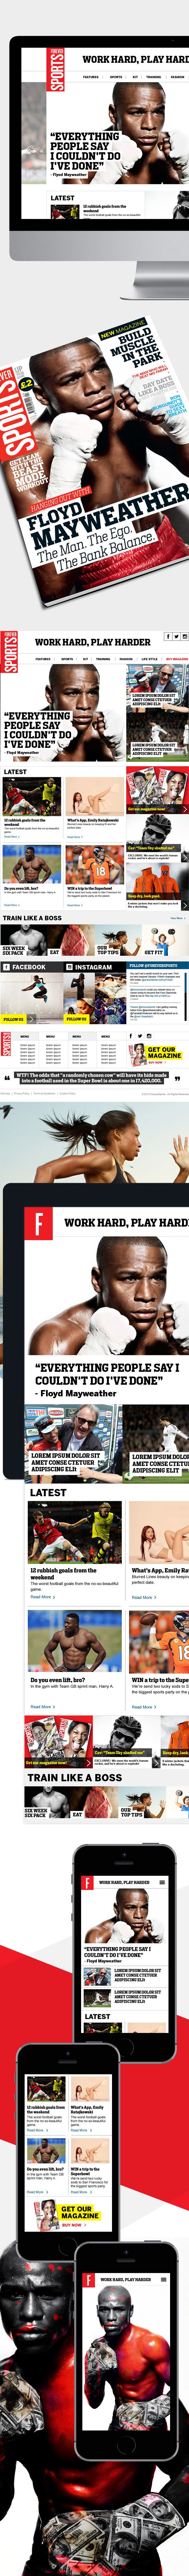 Forever Sports responsive site design